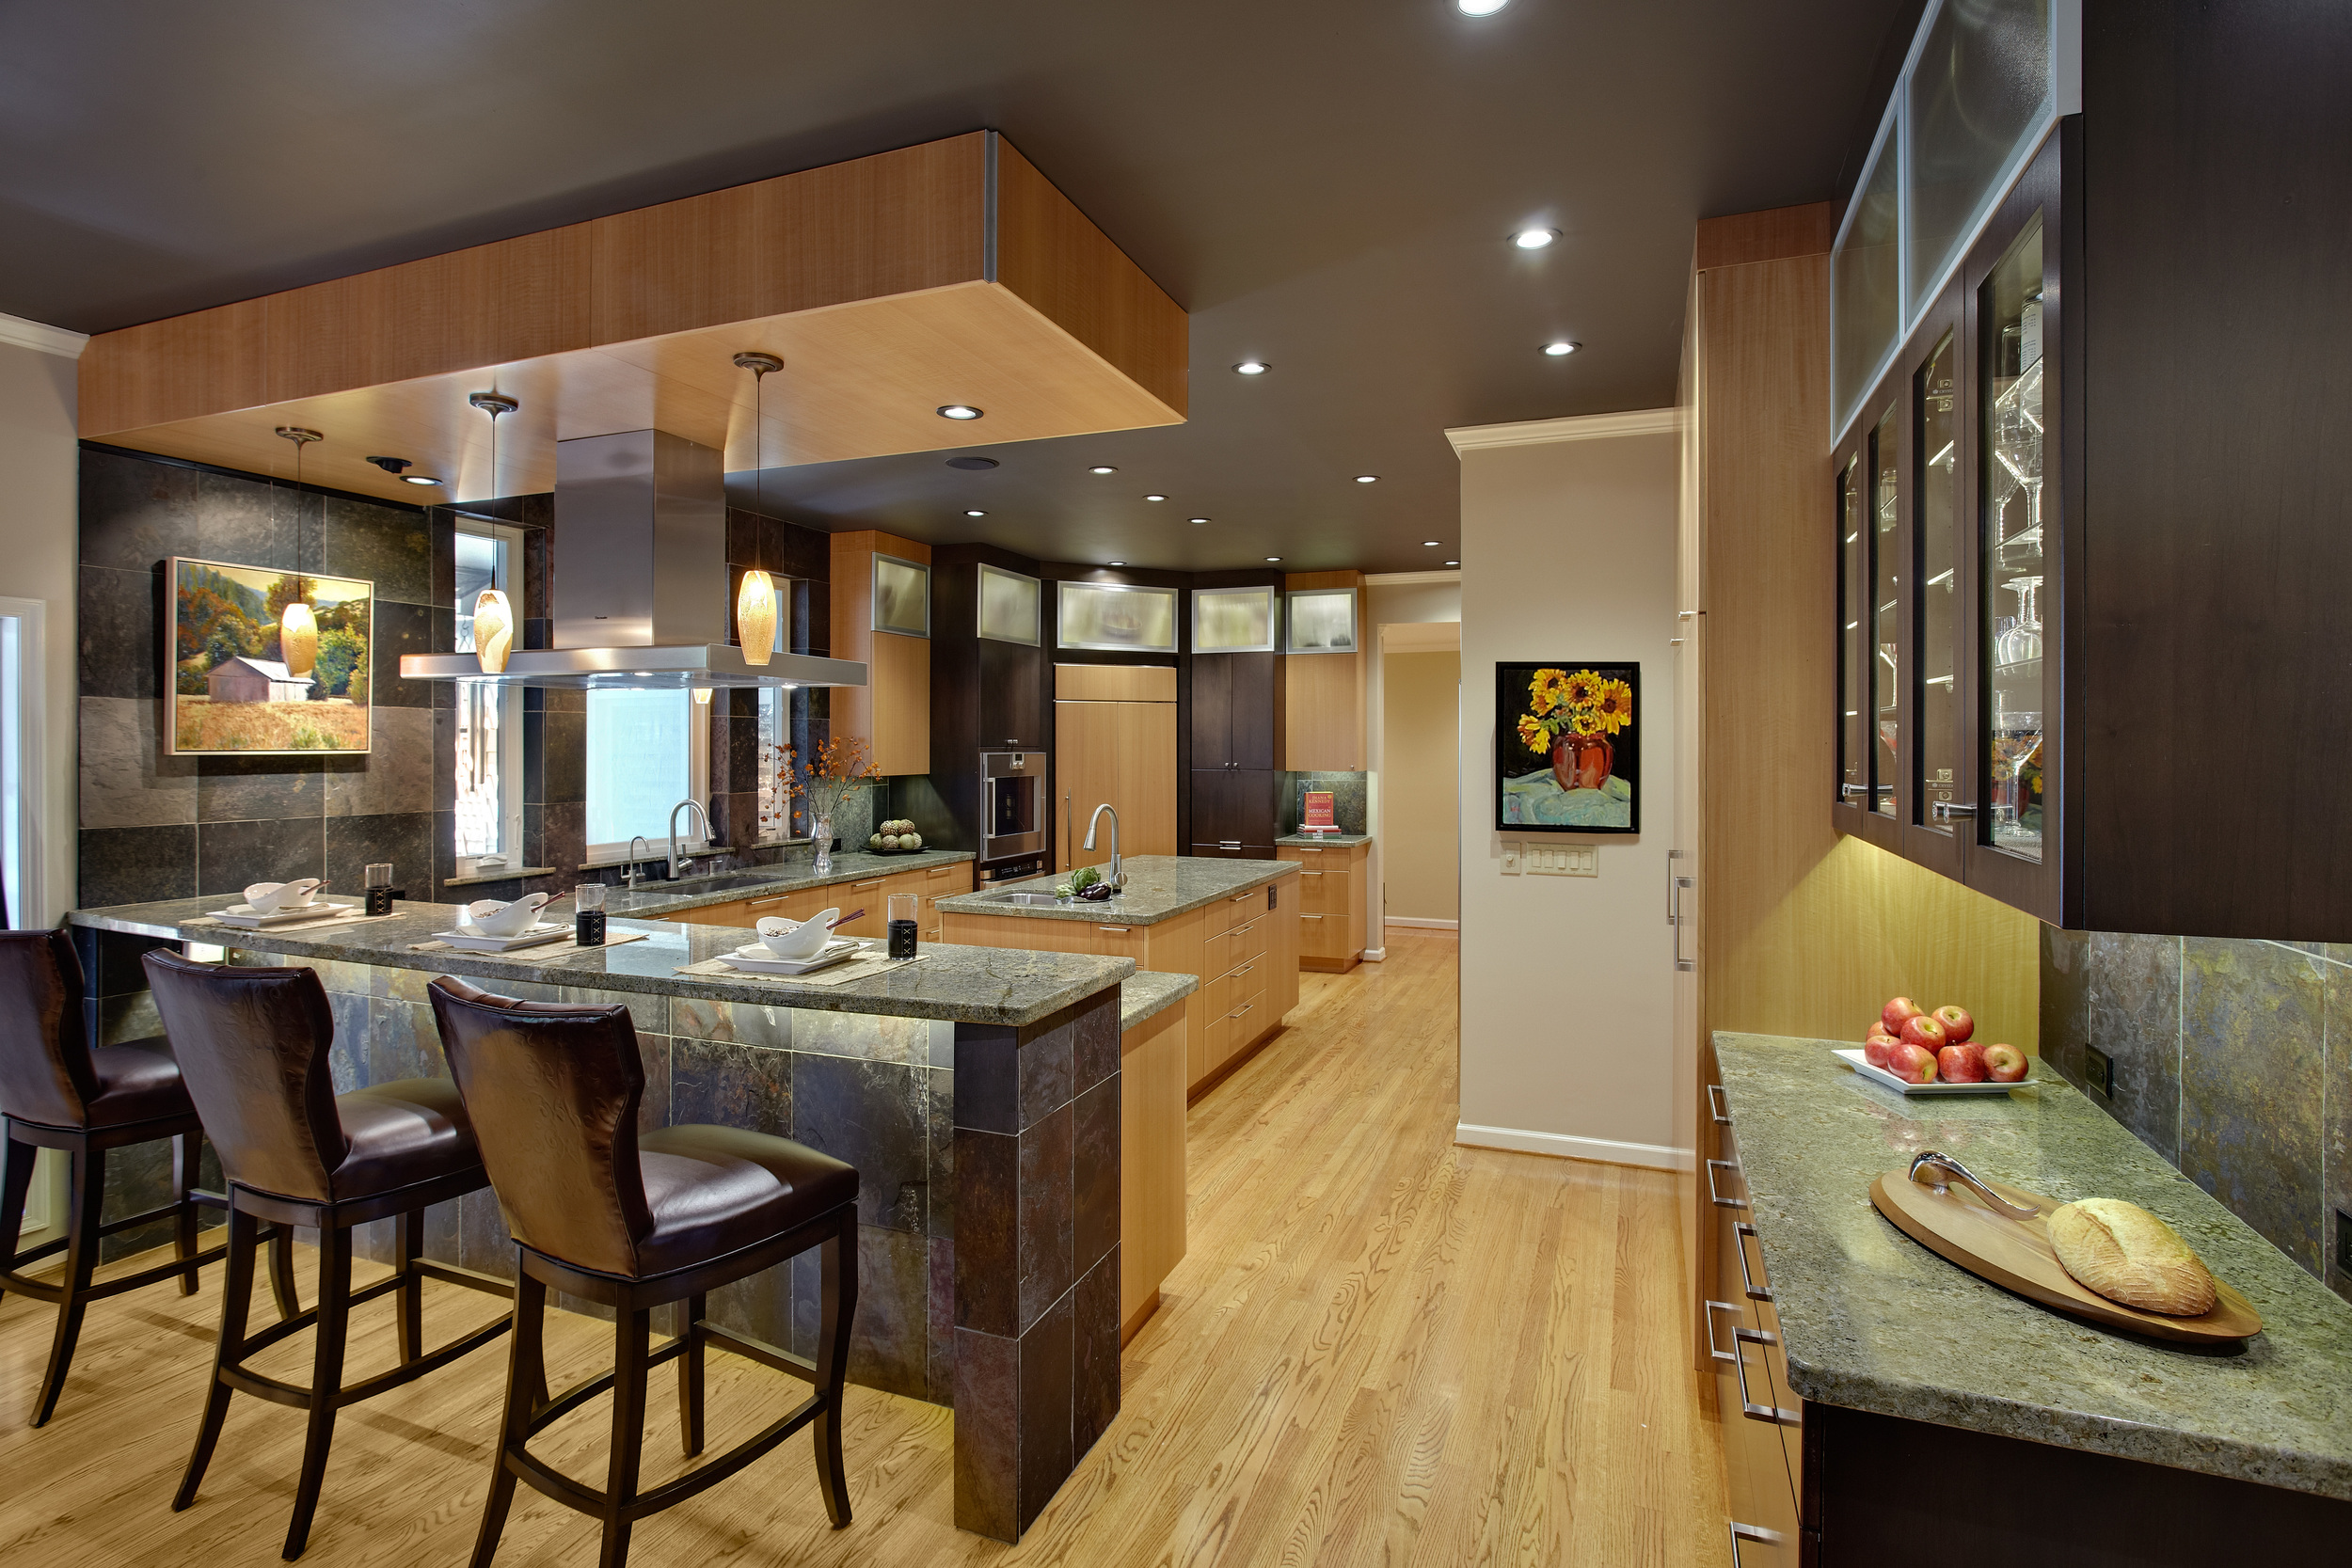 kitchen showrooms sacramento commercial ventilation nar design groupwww narfinecarpentry com fine carpentry cabinetry warm bistro style